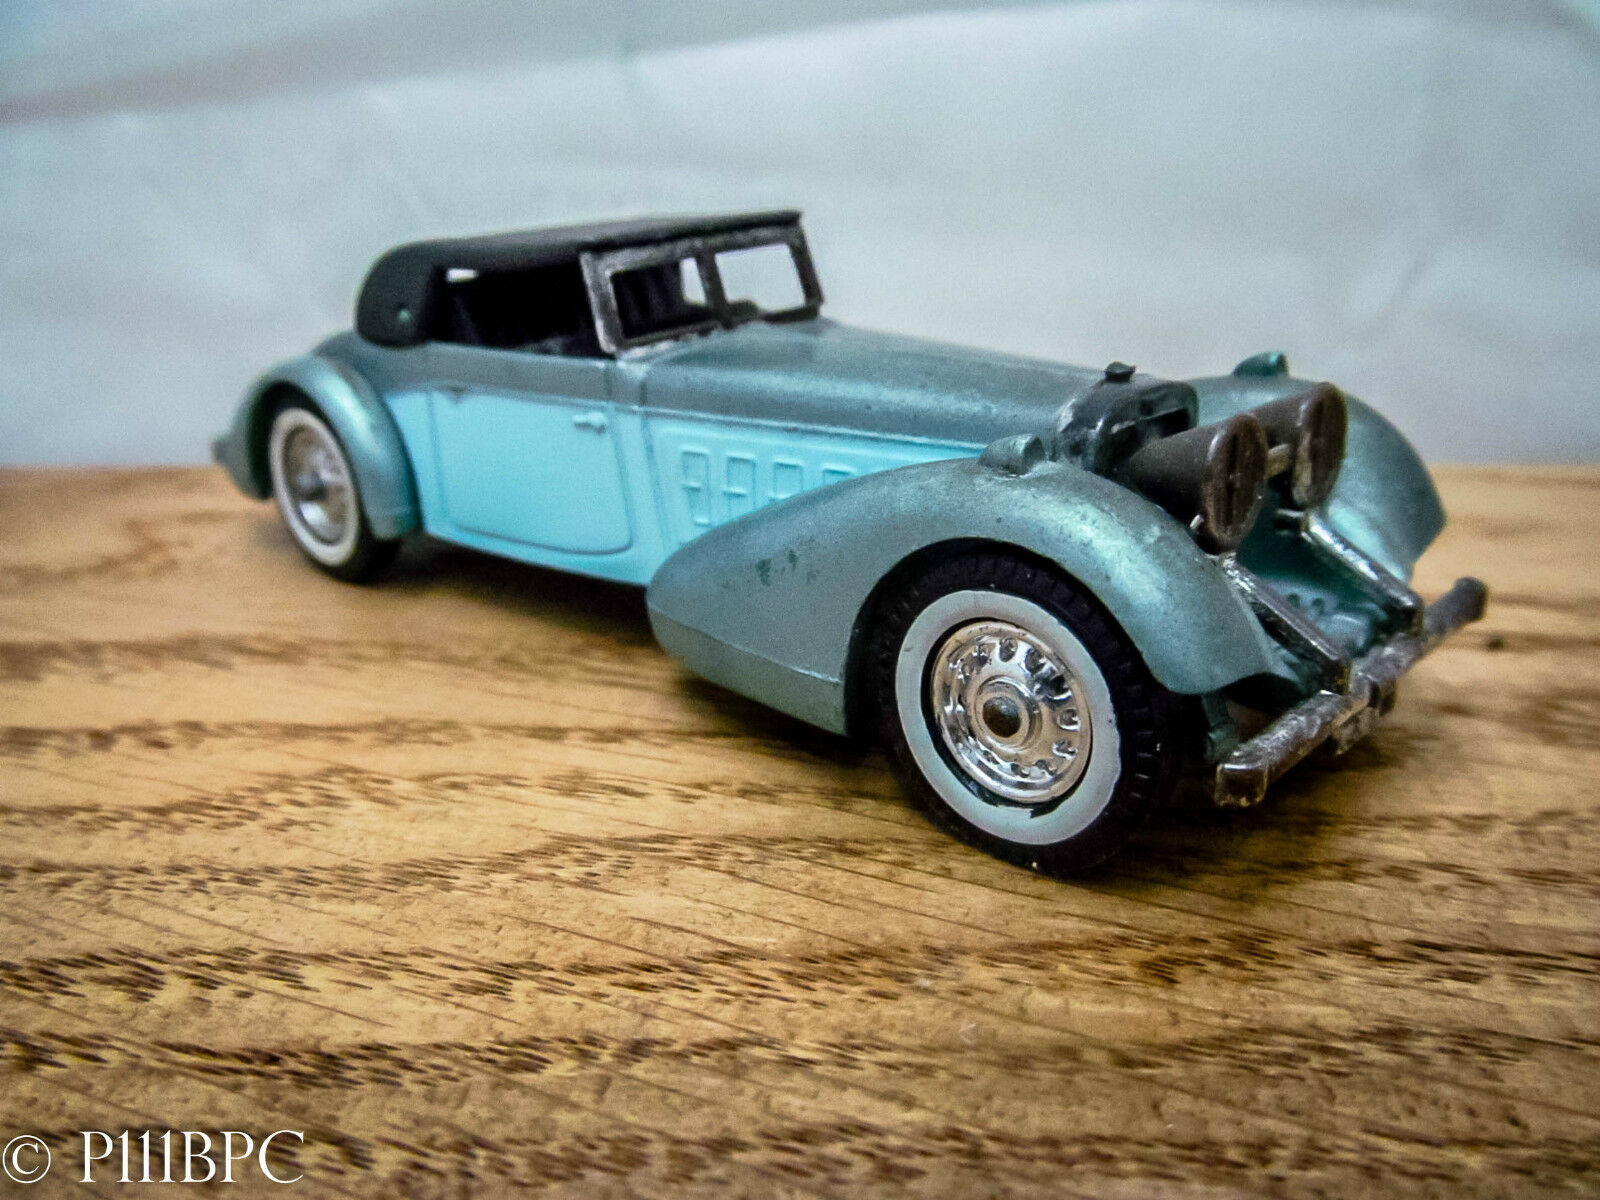 Matchbox Yesteryear Y17-1 1938 Hispano-Suiza - Code 3 (B51)